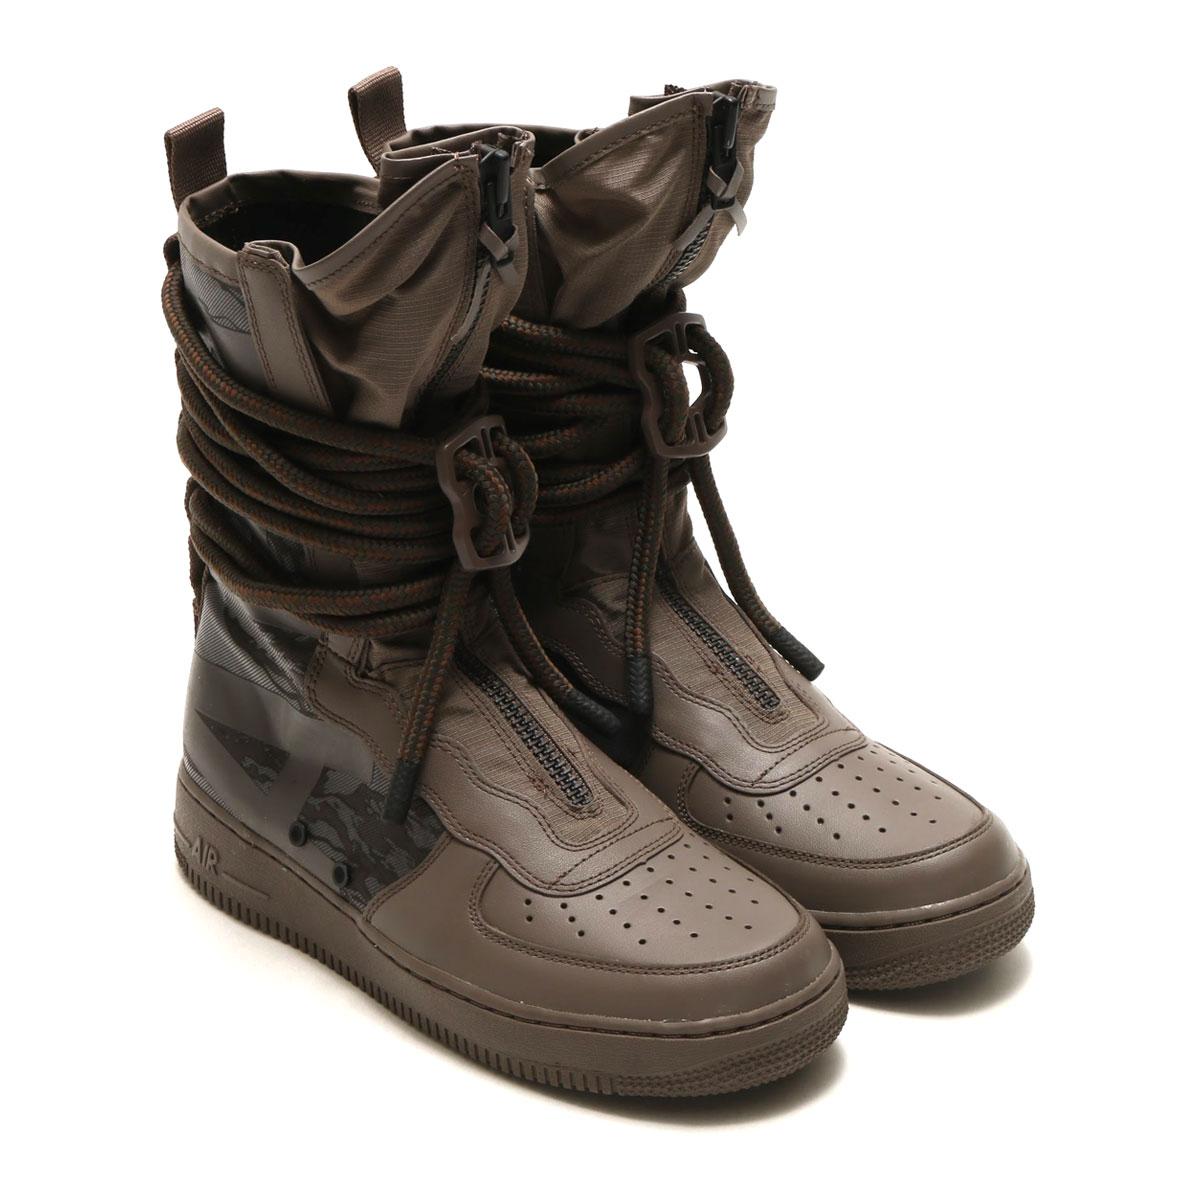 nike sf af1 hi boot